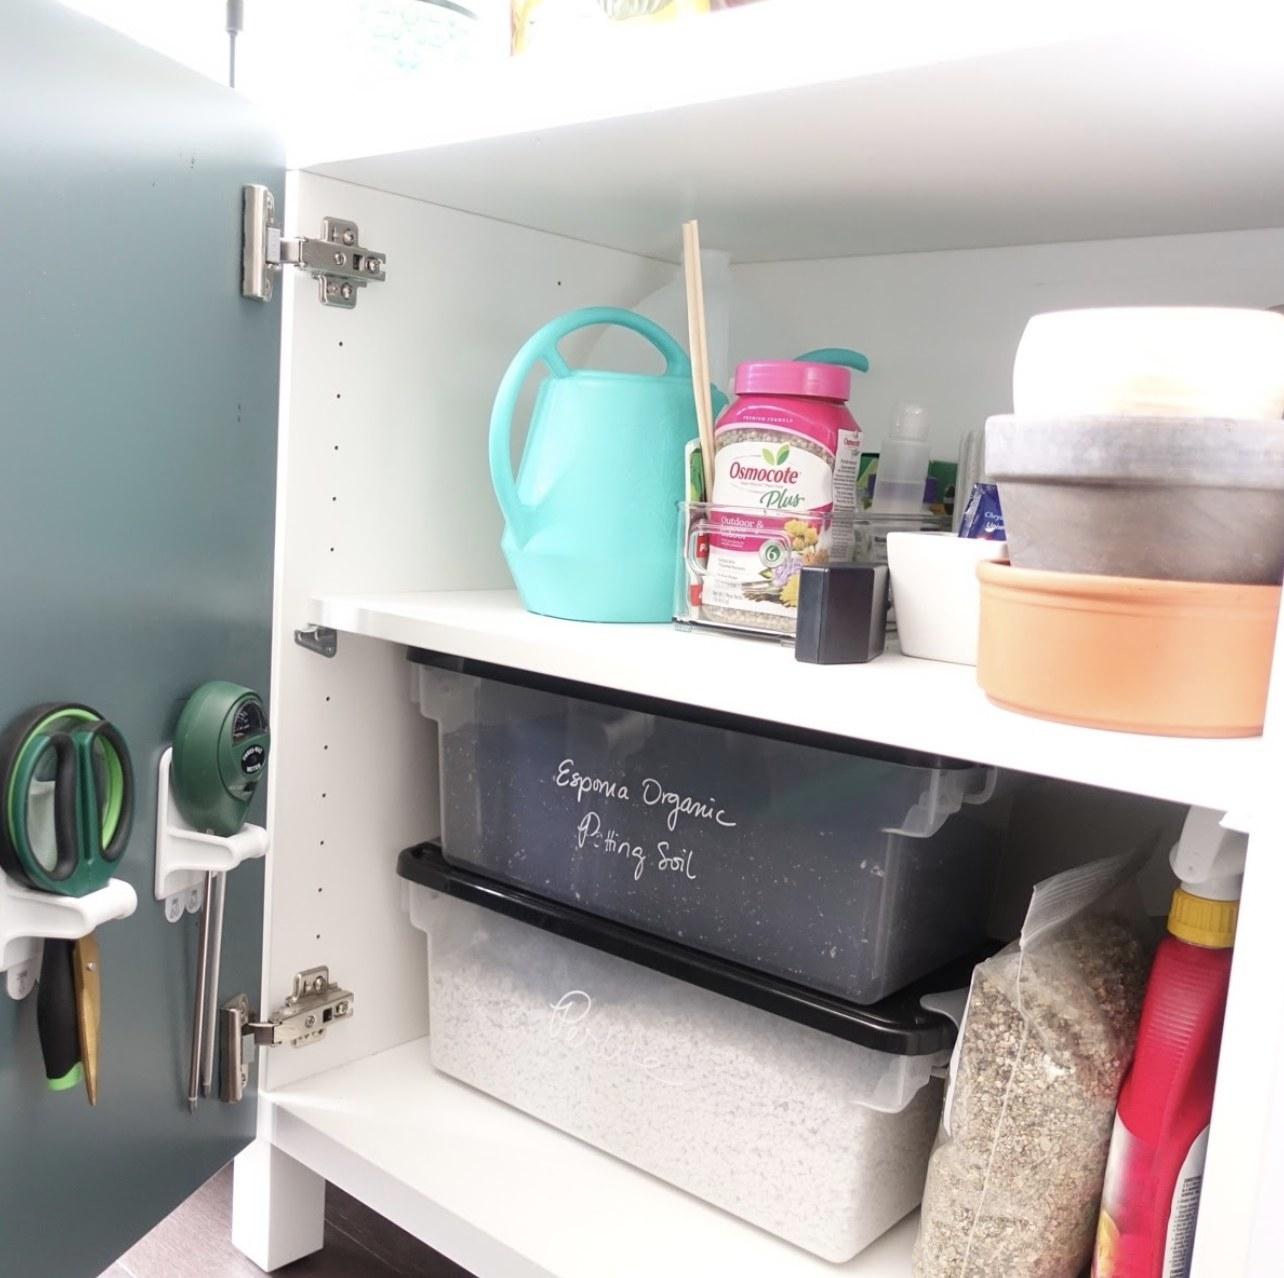 A cabinet of gardening supplies